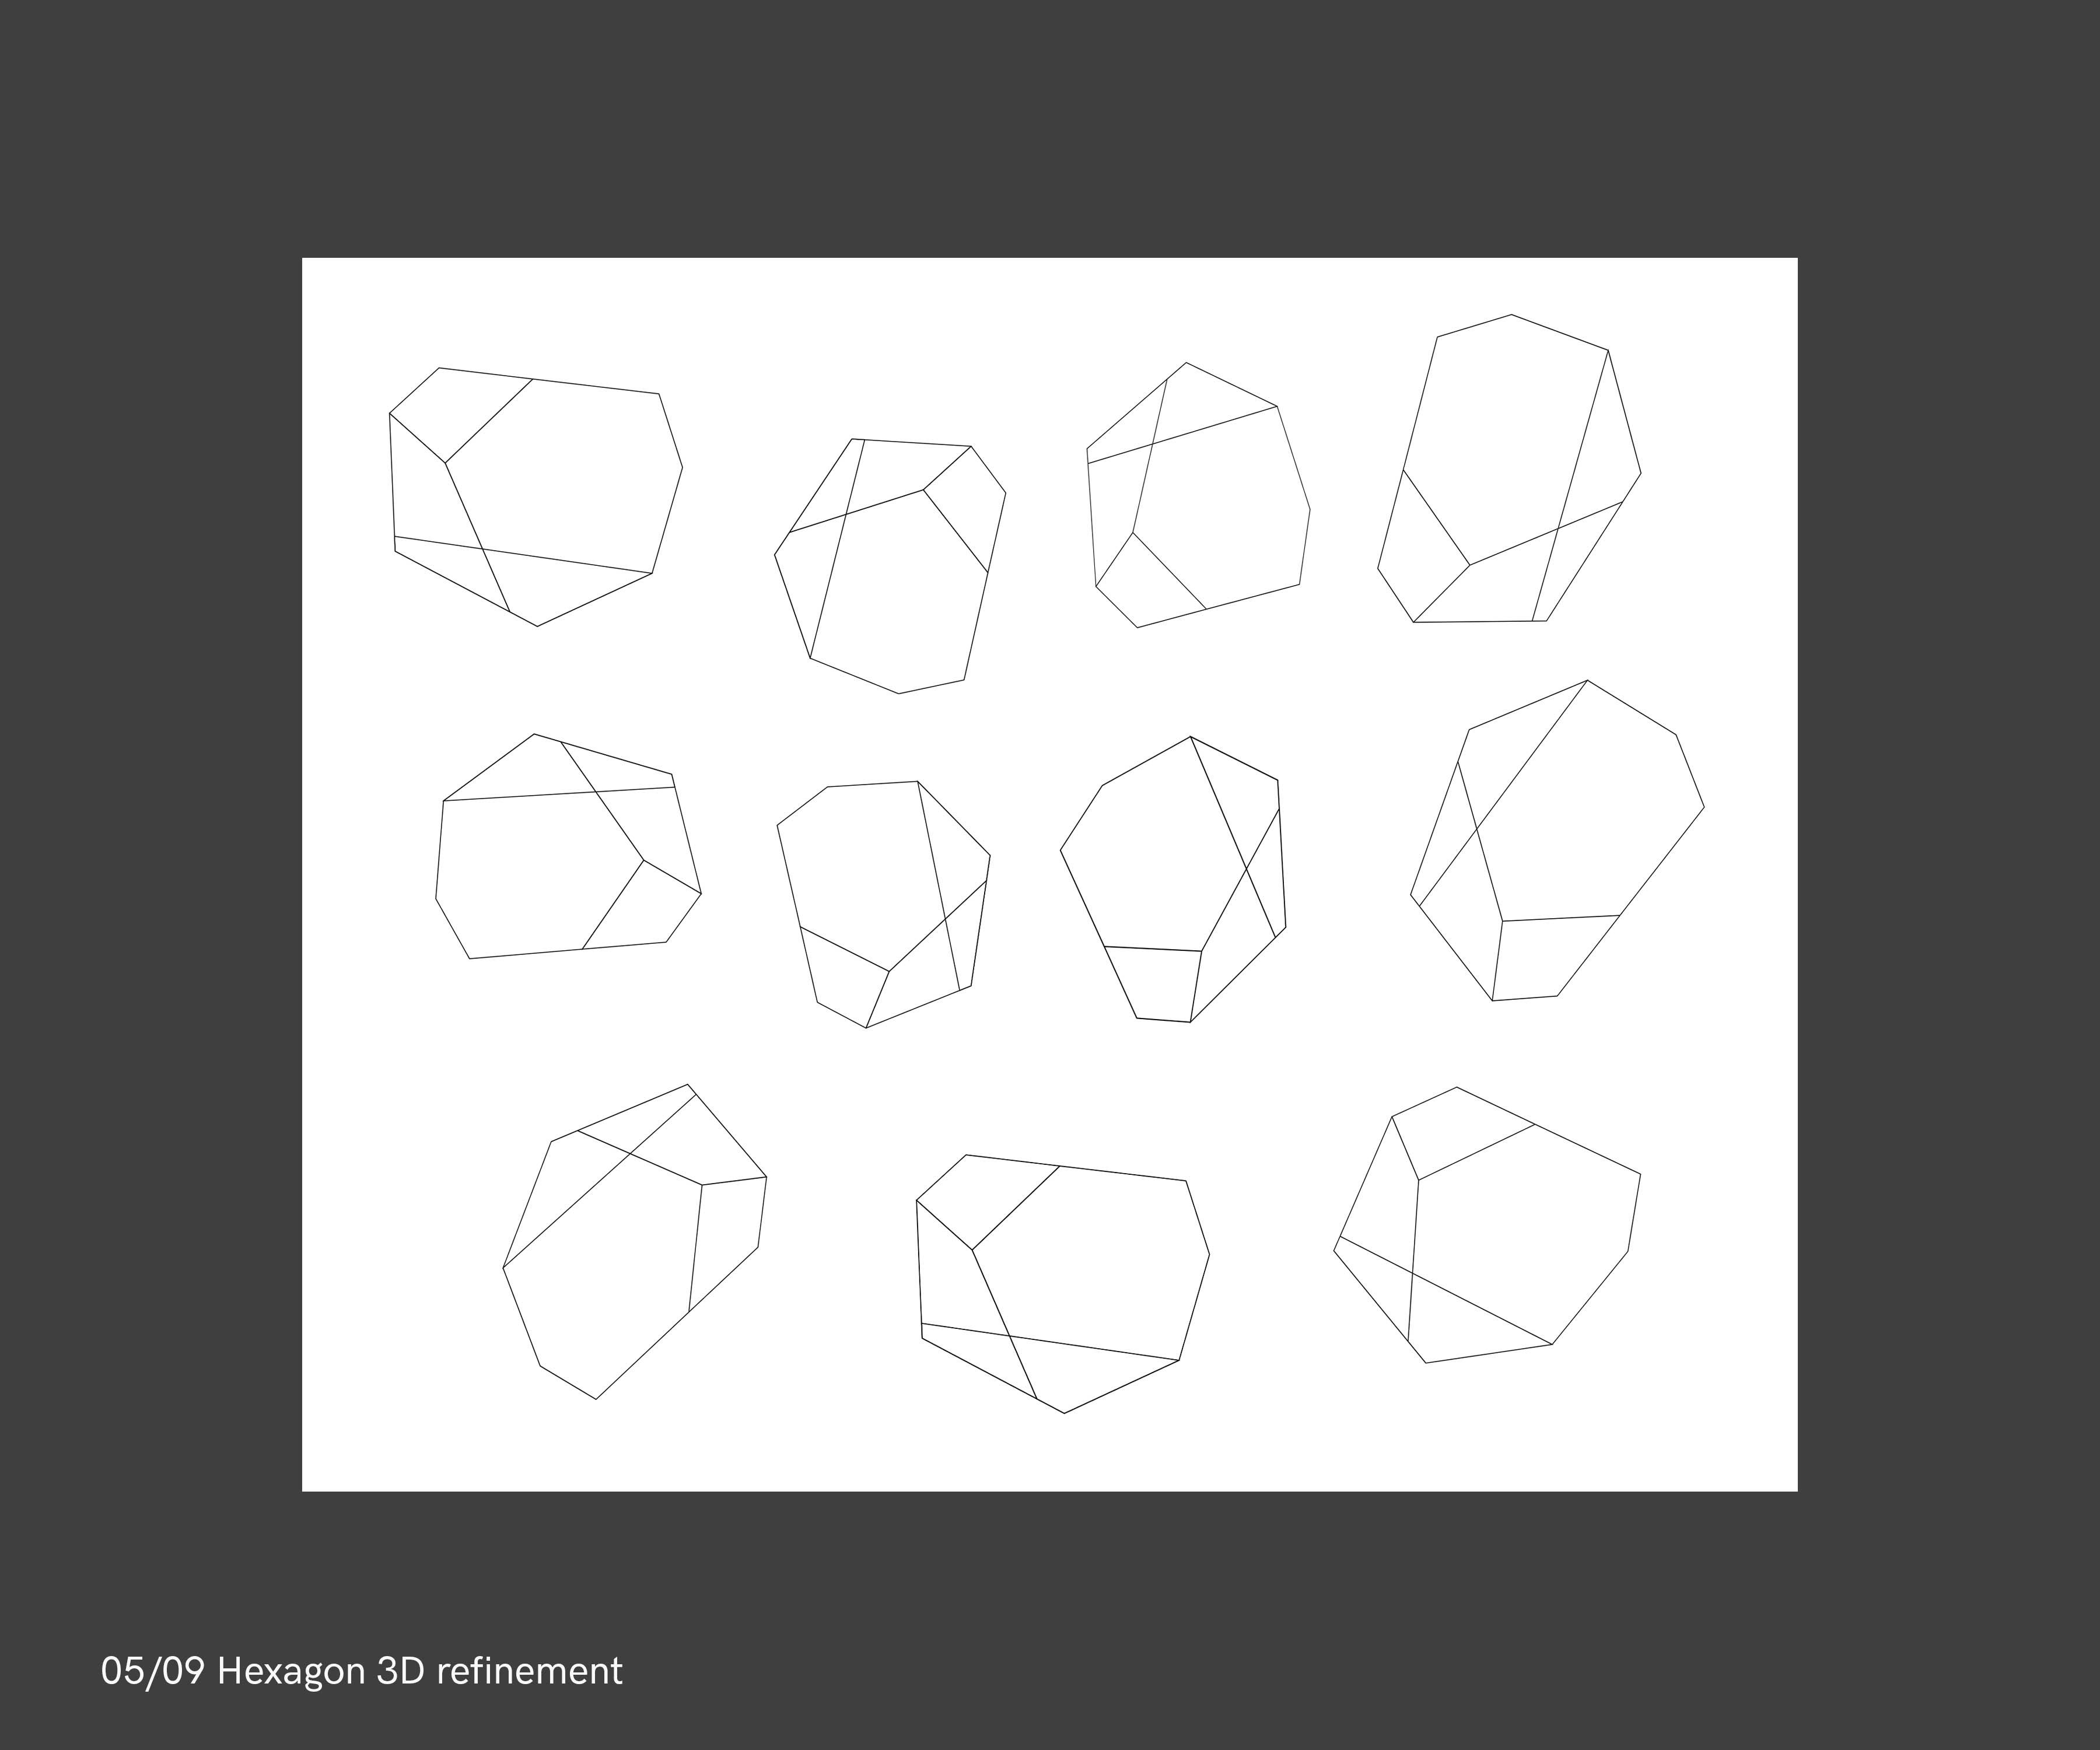 b_process_logo2_digital-5.1